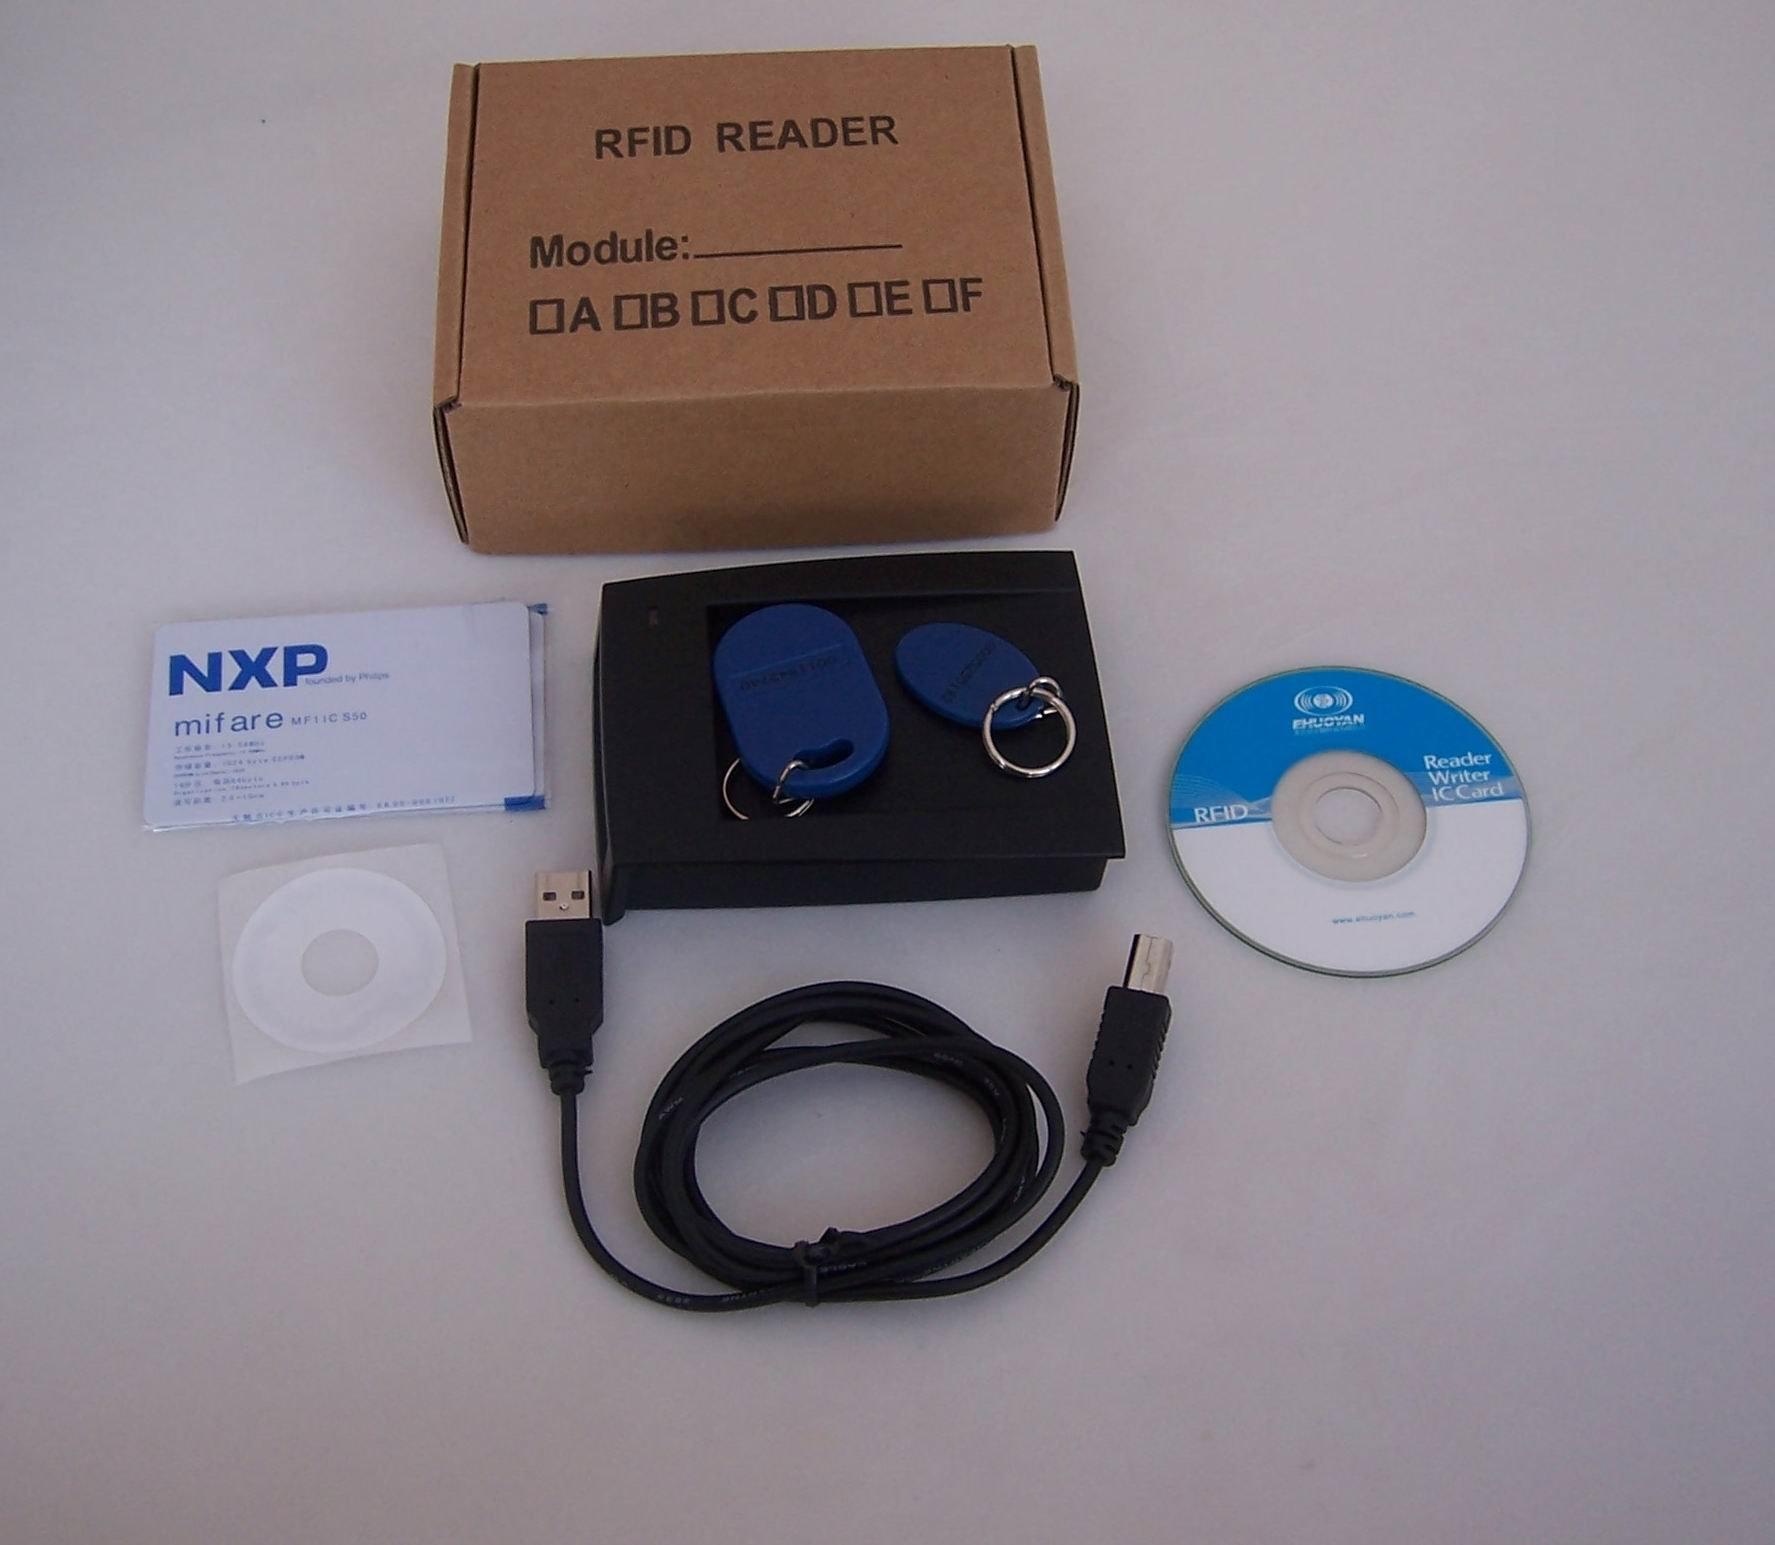 13-56Mhz-RFID-R-W-Triple-Protocol-USB-YHY638FU-SDK-Utility-Software-TAGS.jpg